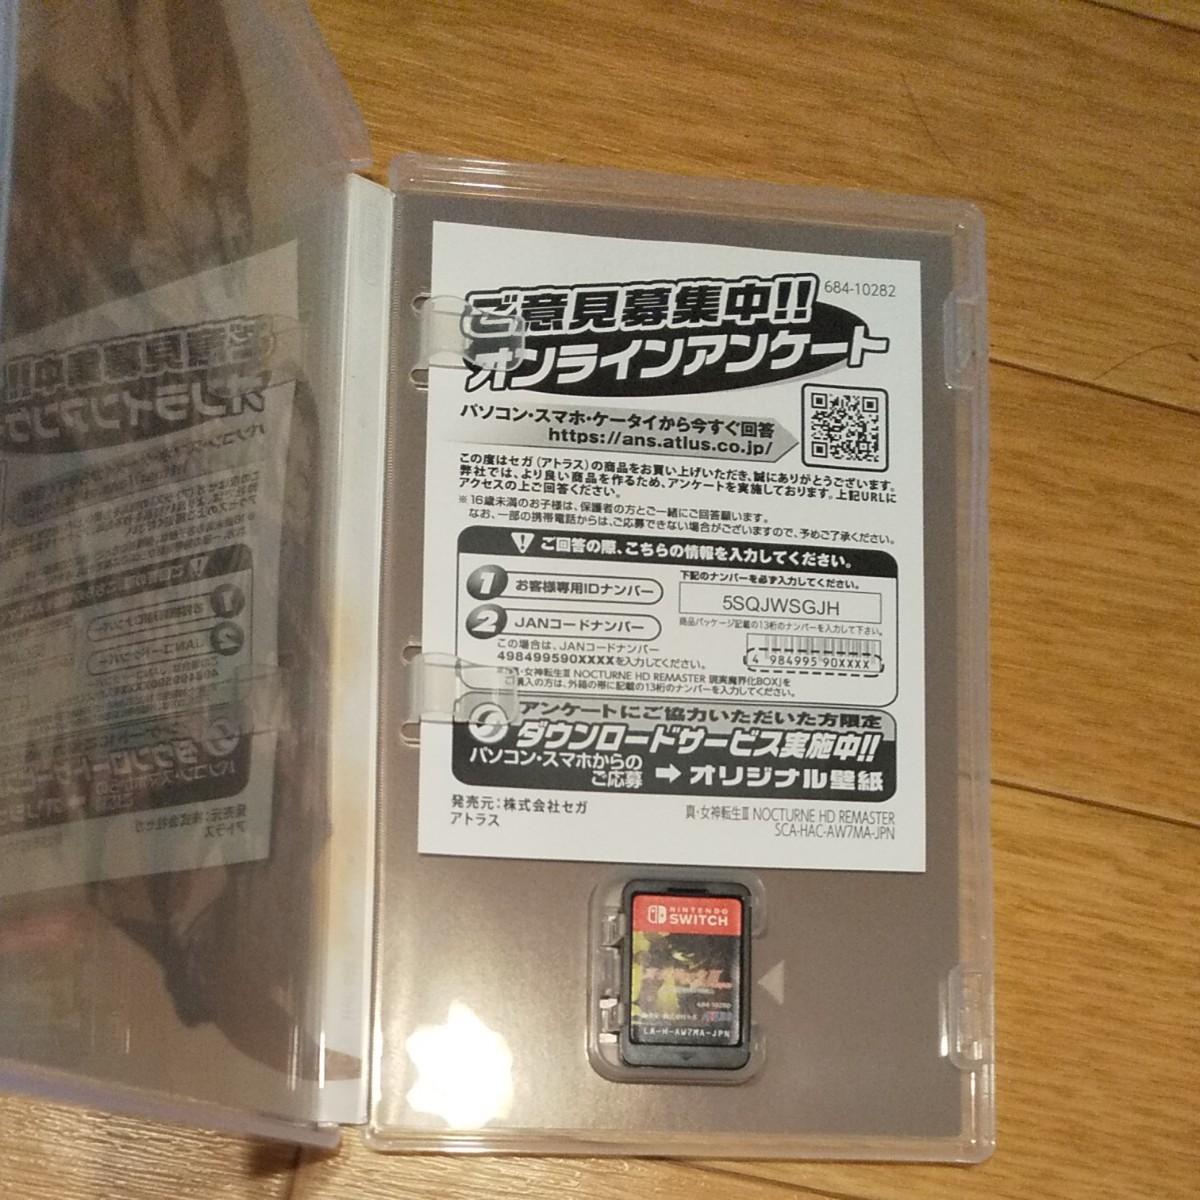 真・女神転生Ⅲ nocturne Nintendo Switch